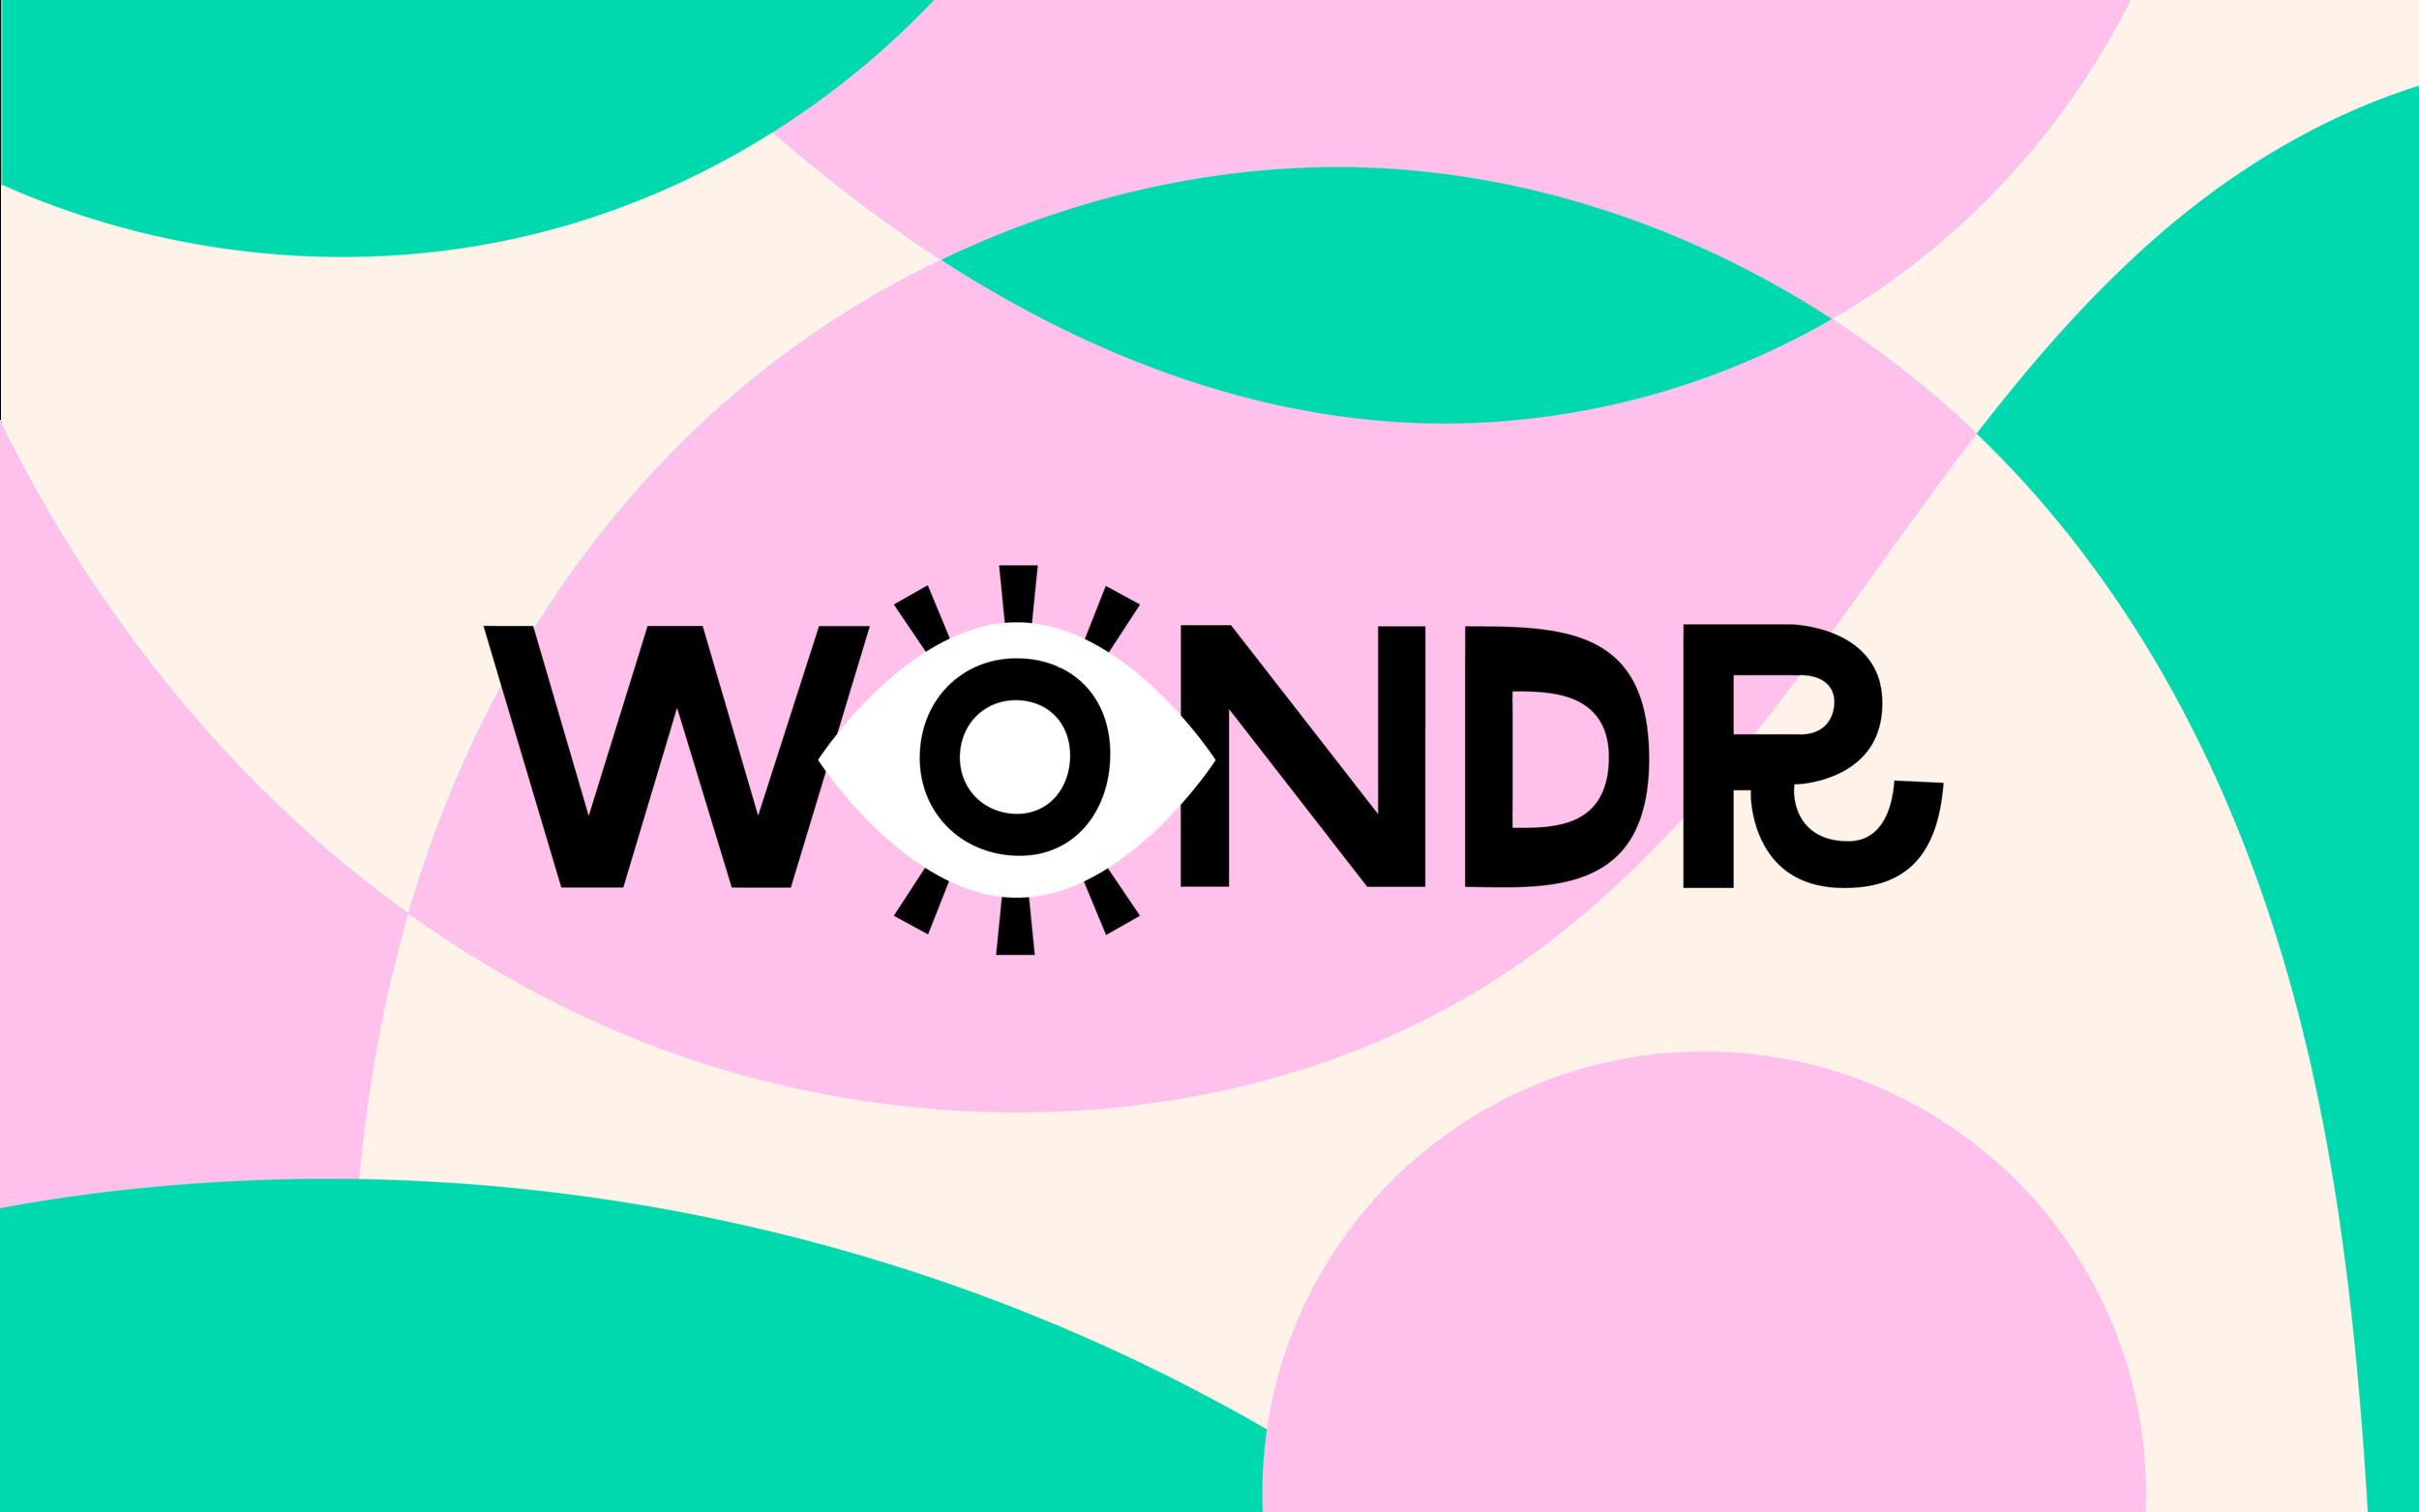 Wonder_Final-08.png